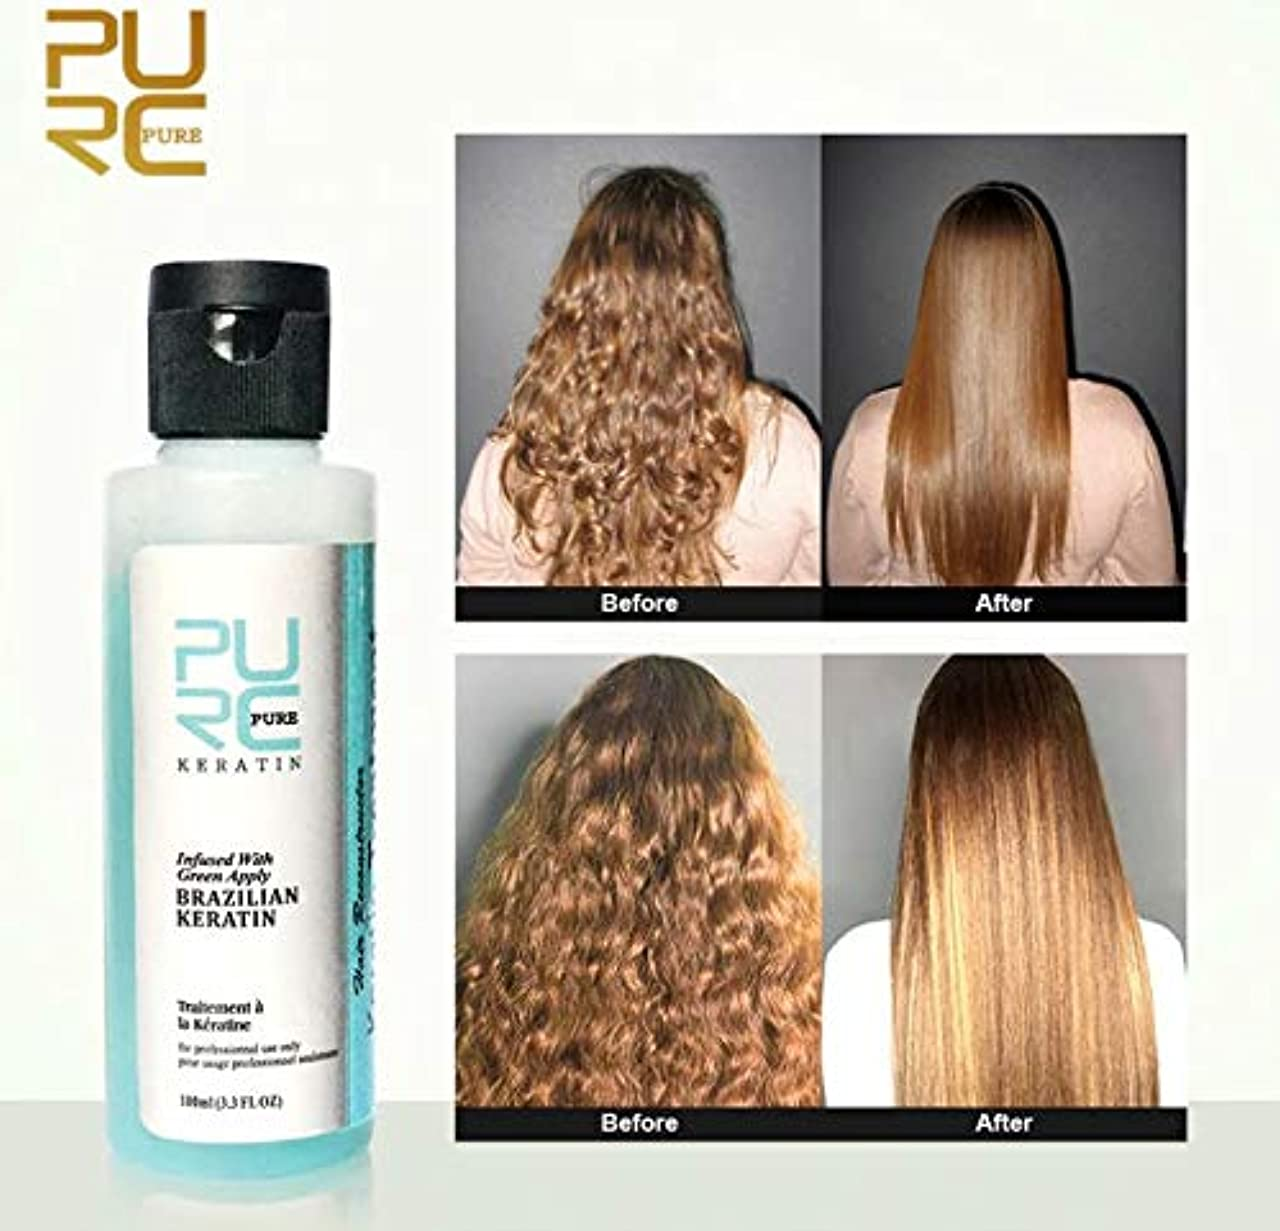 劇的常習者劇場PURC 3.7% Apple Flavor Keratin Treatment Straightening Hair Repair Damage Frizzy Hair Brazilian Keratin Treatment...